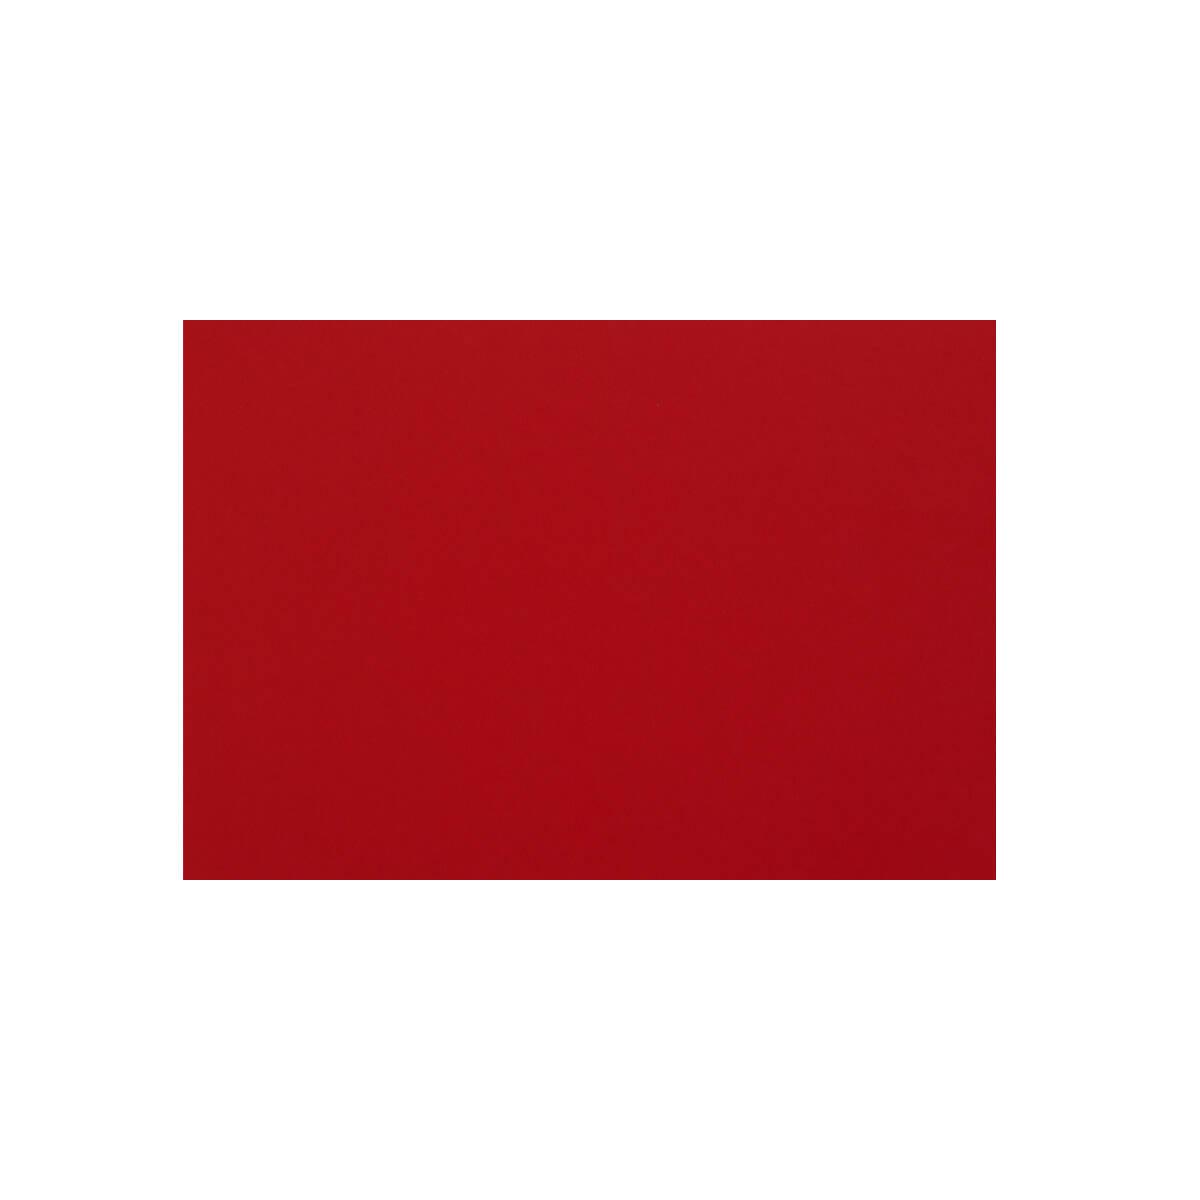 C5 DARK RED PEEL AND SEAL ENVELOPES